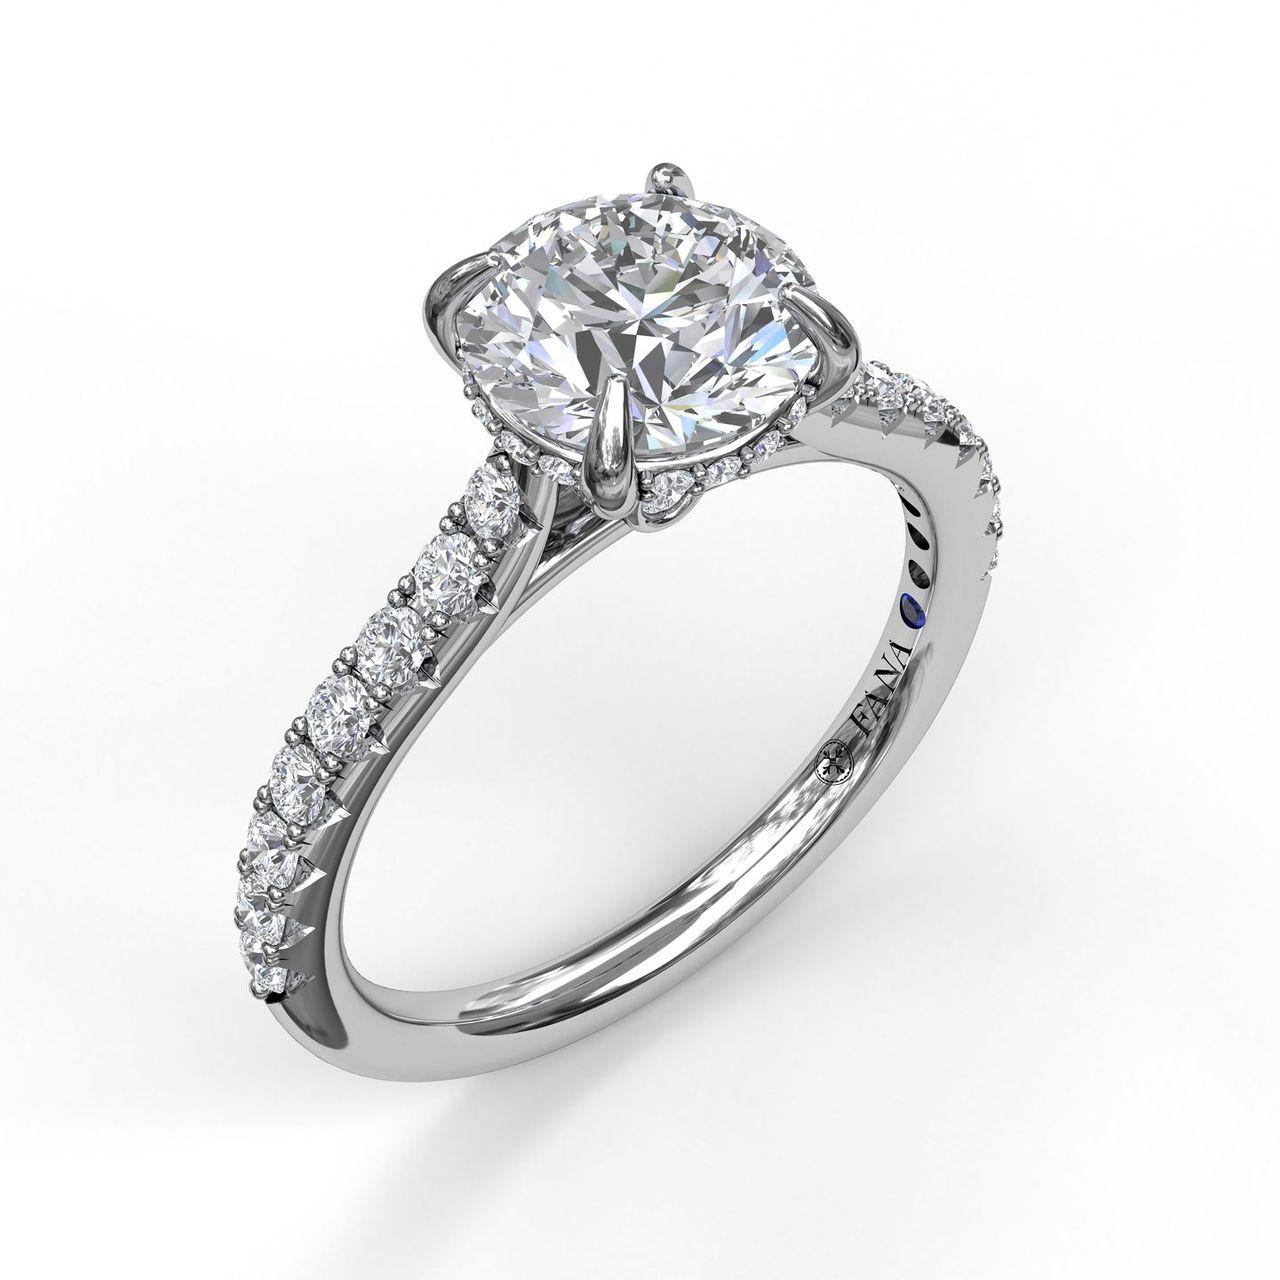 Classic Engagement Ring with a Subtle Diamond Splash